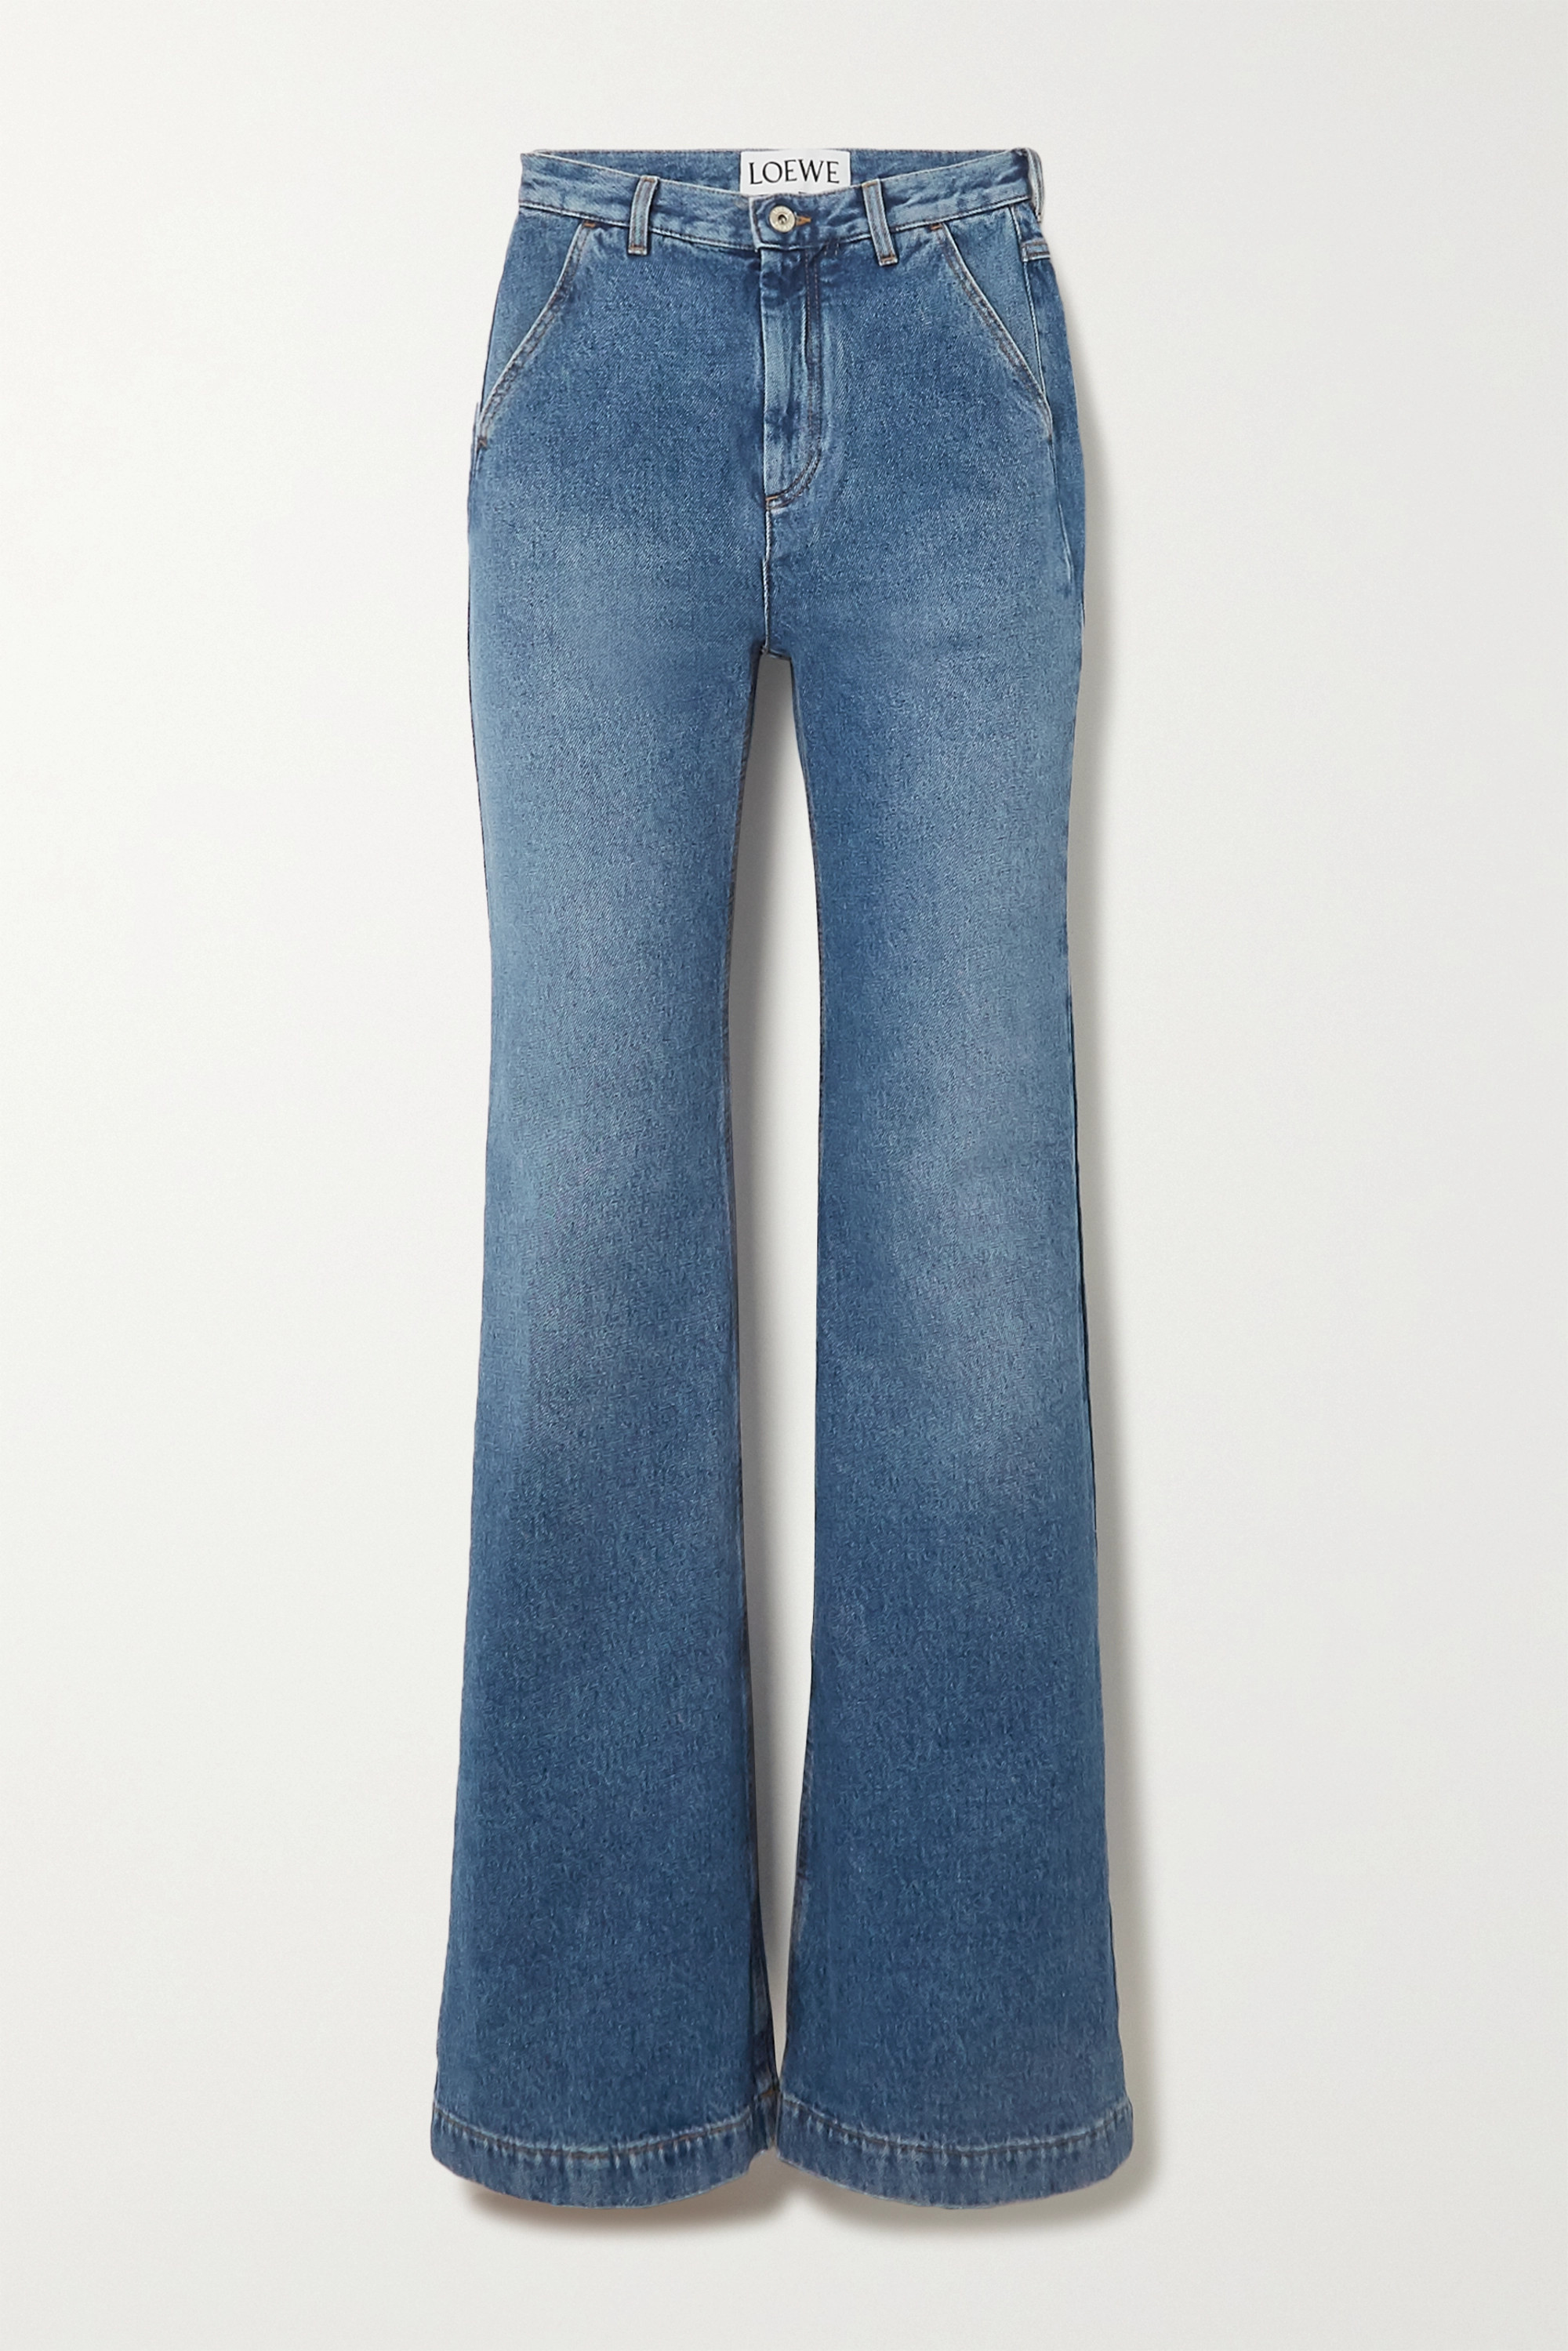 Loewe High-rise straight-leg jeans